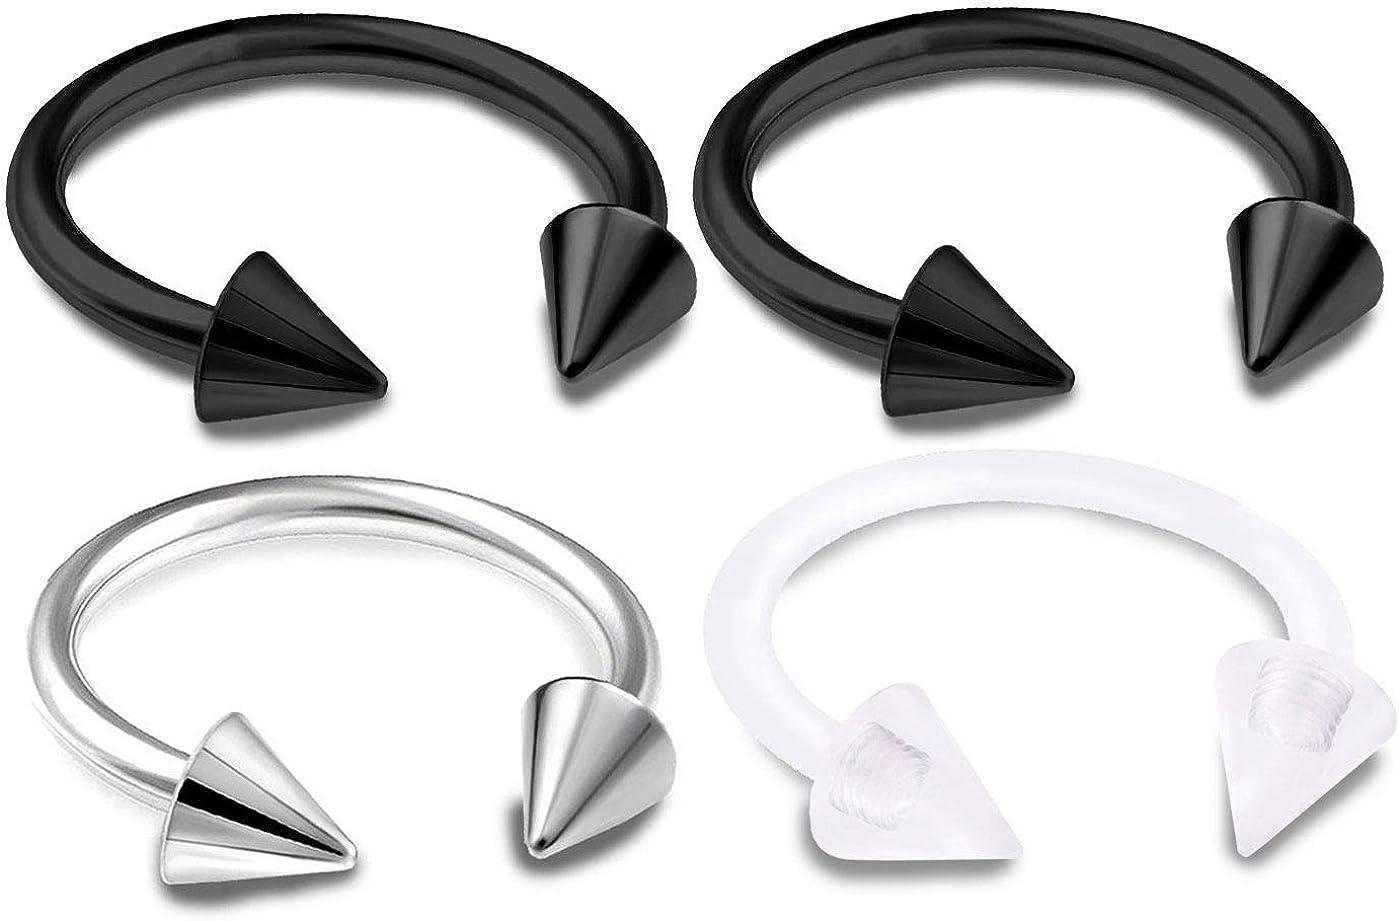 Details about  /2Pc Spike Circular Barbell Ring Ear Cartilage Tragus Piercing Labret Nose Hoop v